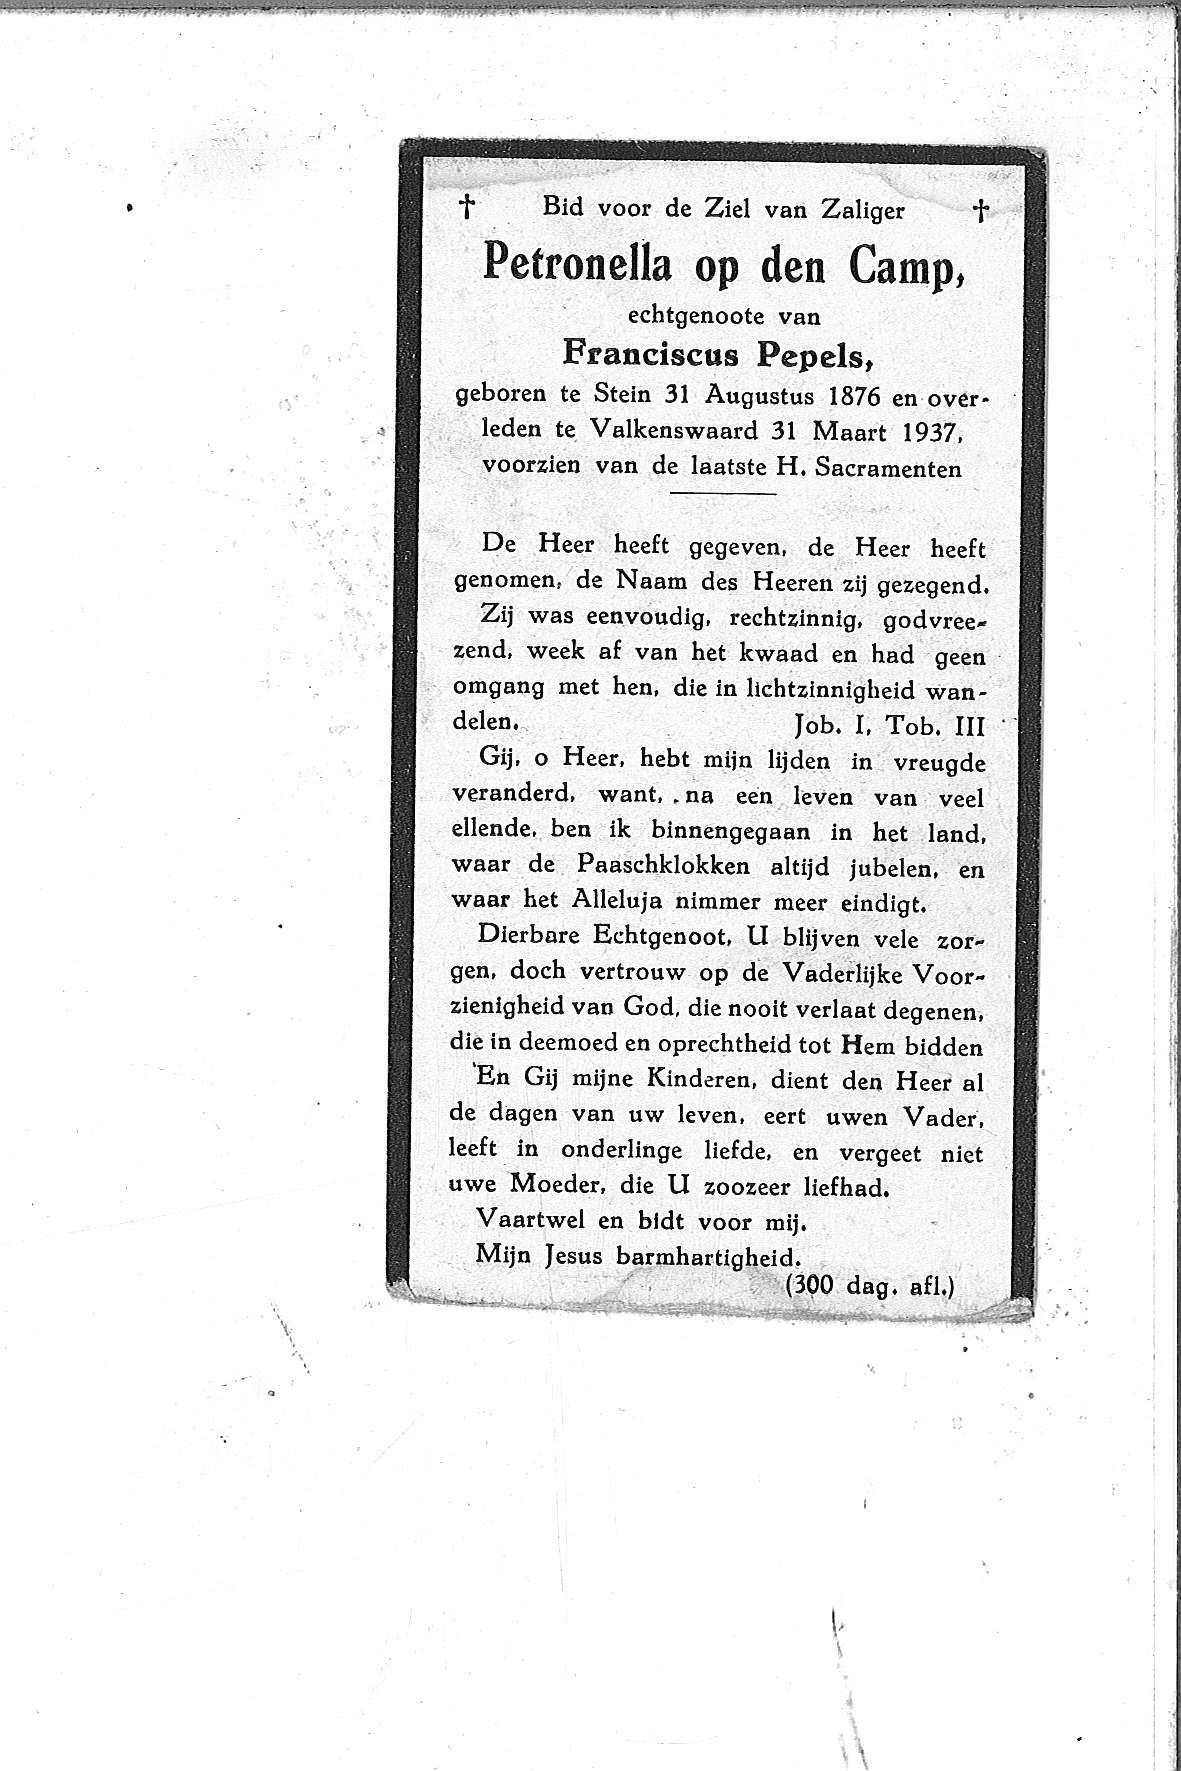 Petronella(1937)20140611123106_00001.jpg